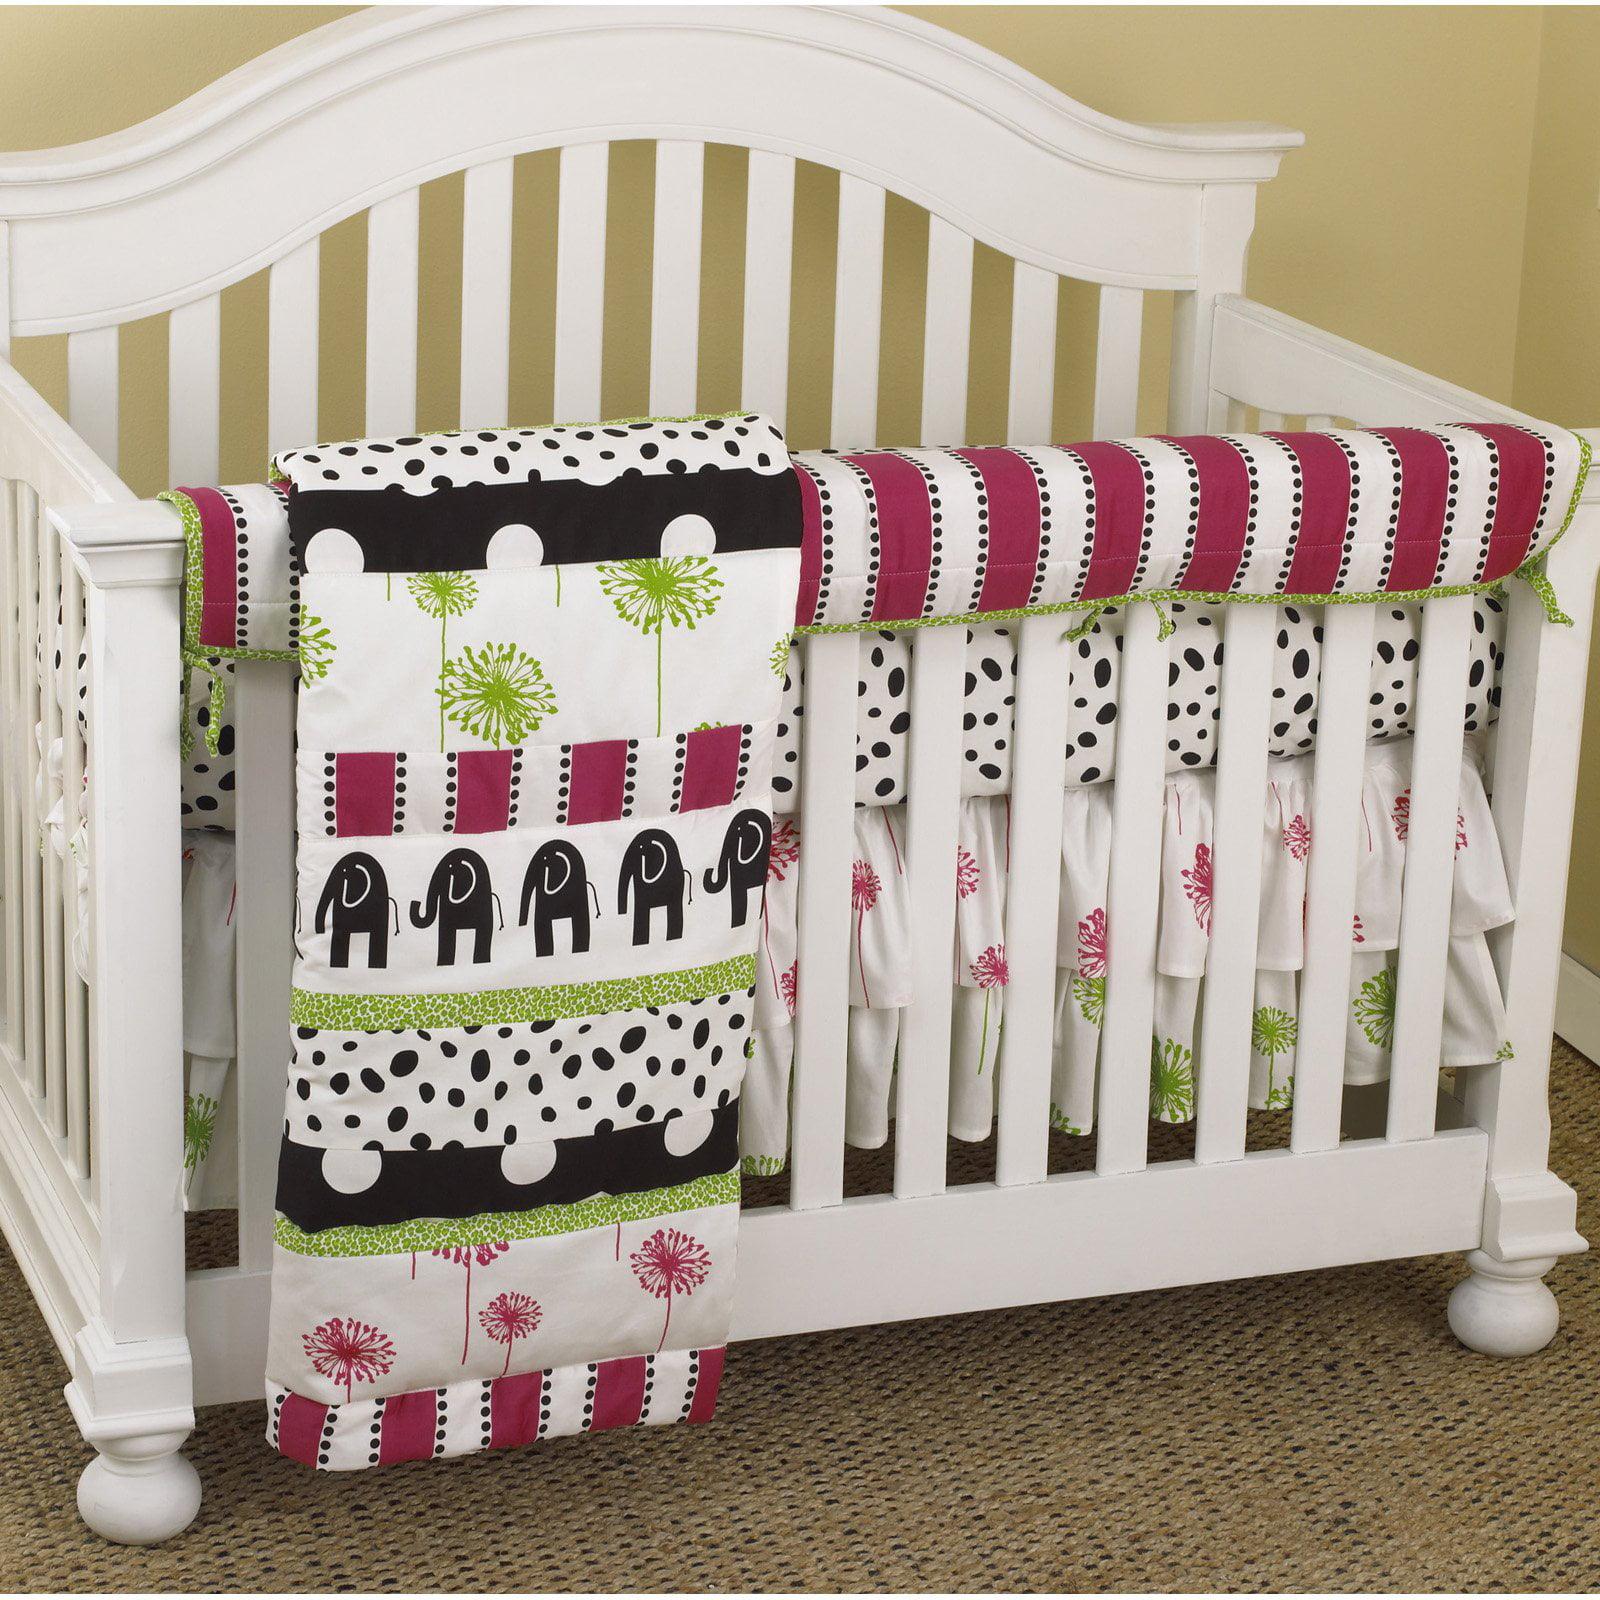 Cotton Tale Designs Hottsie Dottsie Front Crib Rail Cover Up Set